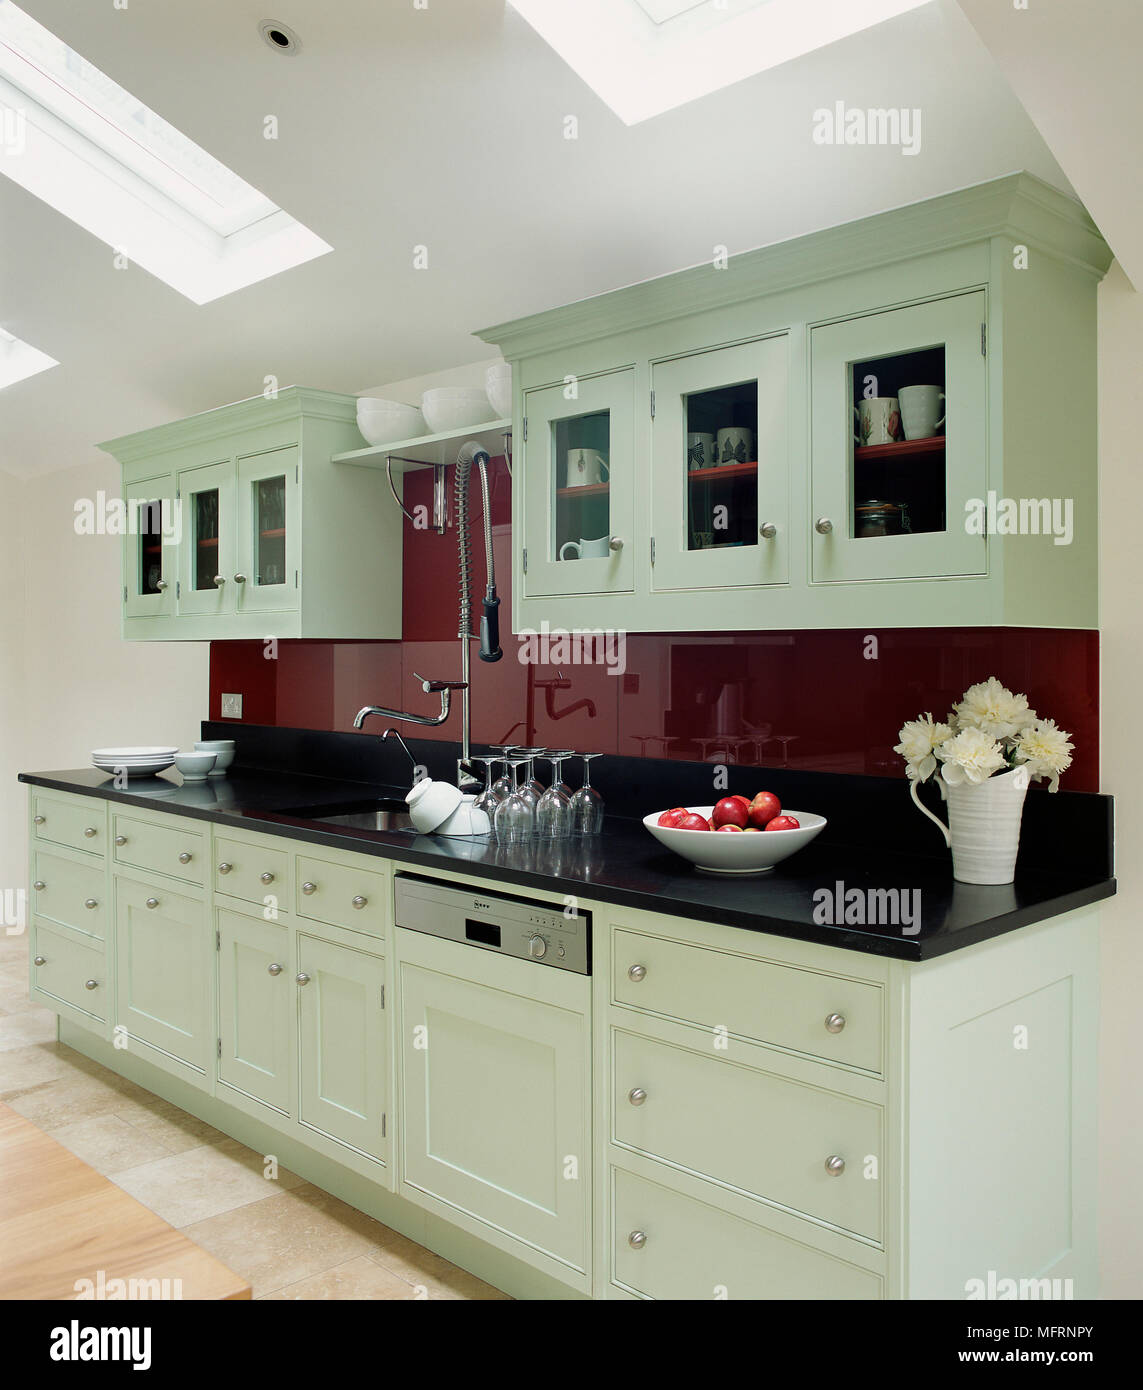 Kitchen With Black Worktops: Modern Country Style Kitchen With Black Worktop And Pale